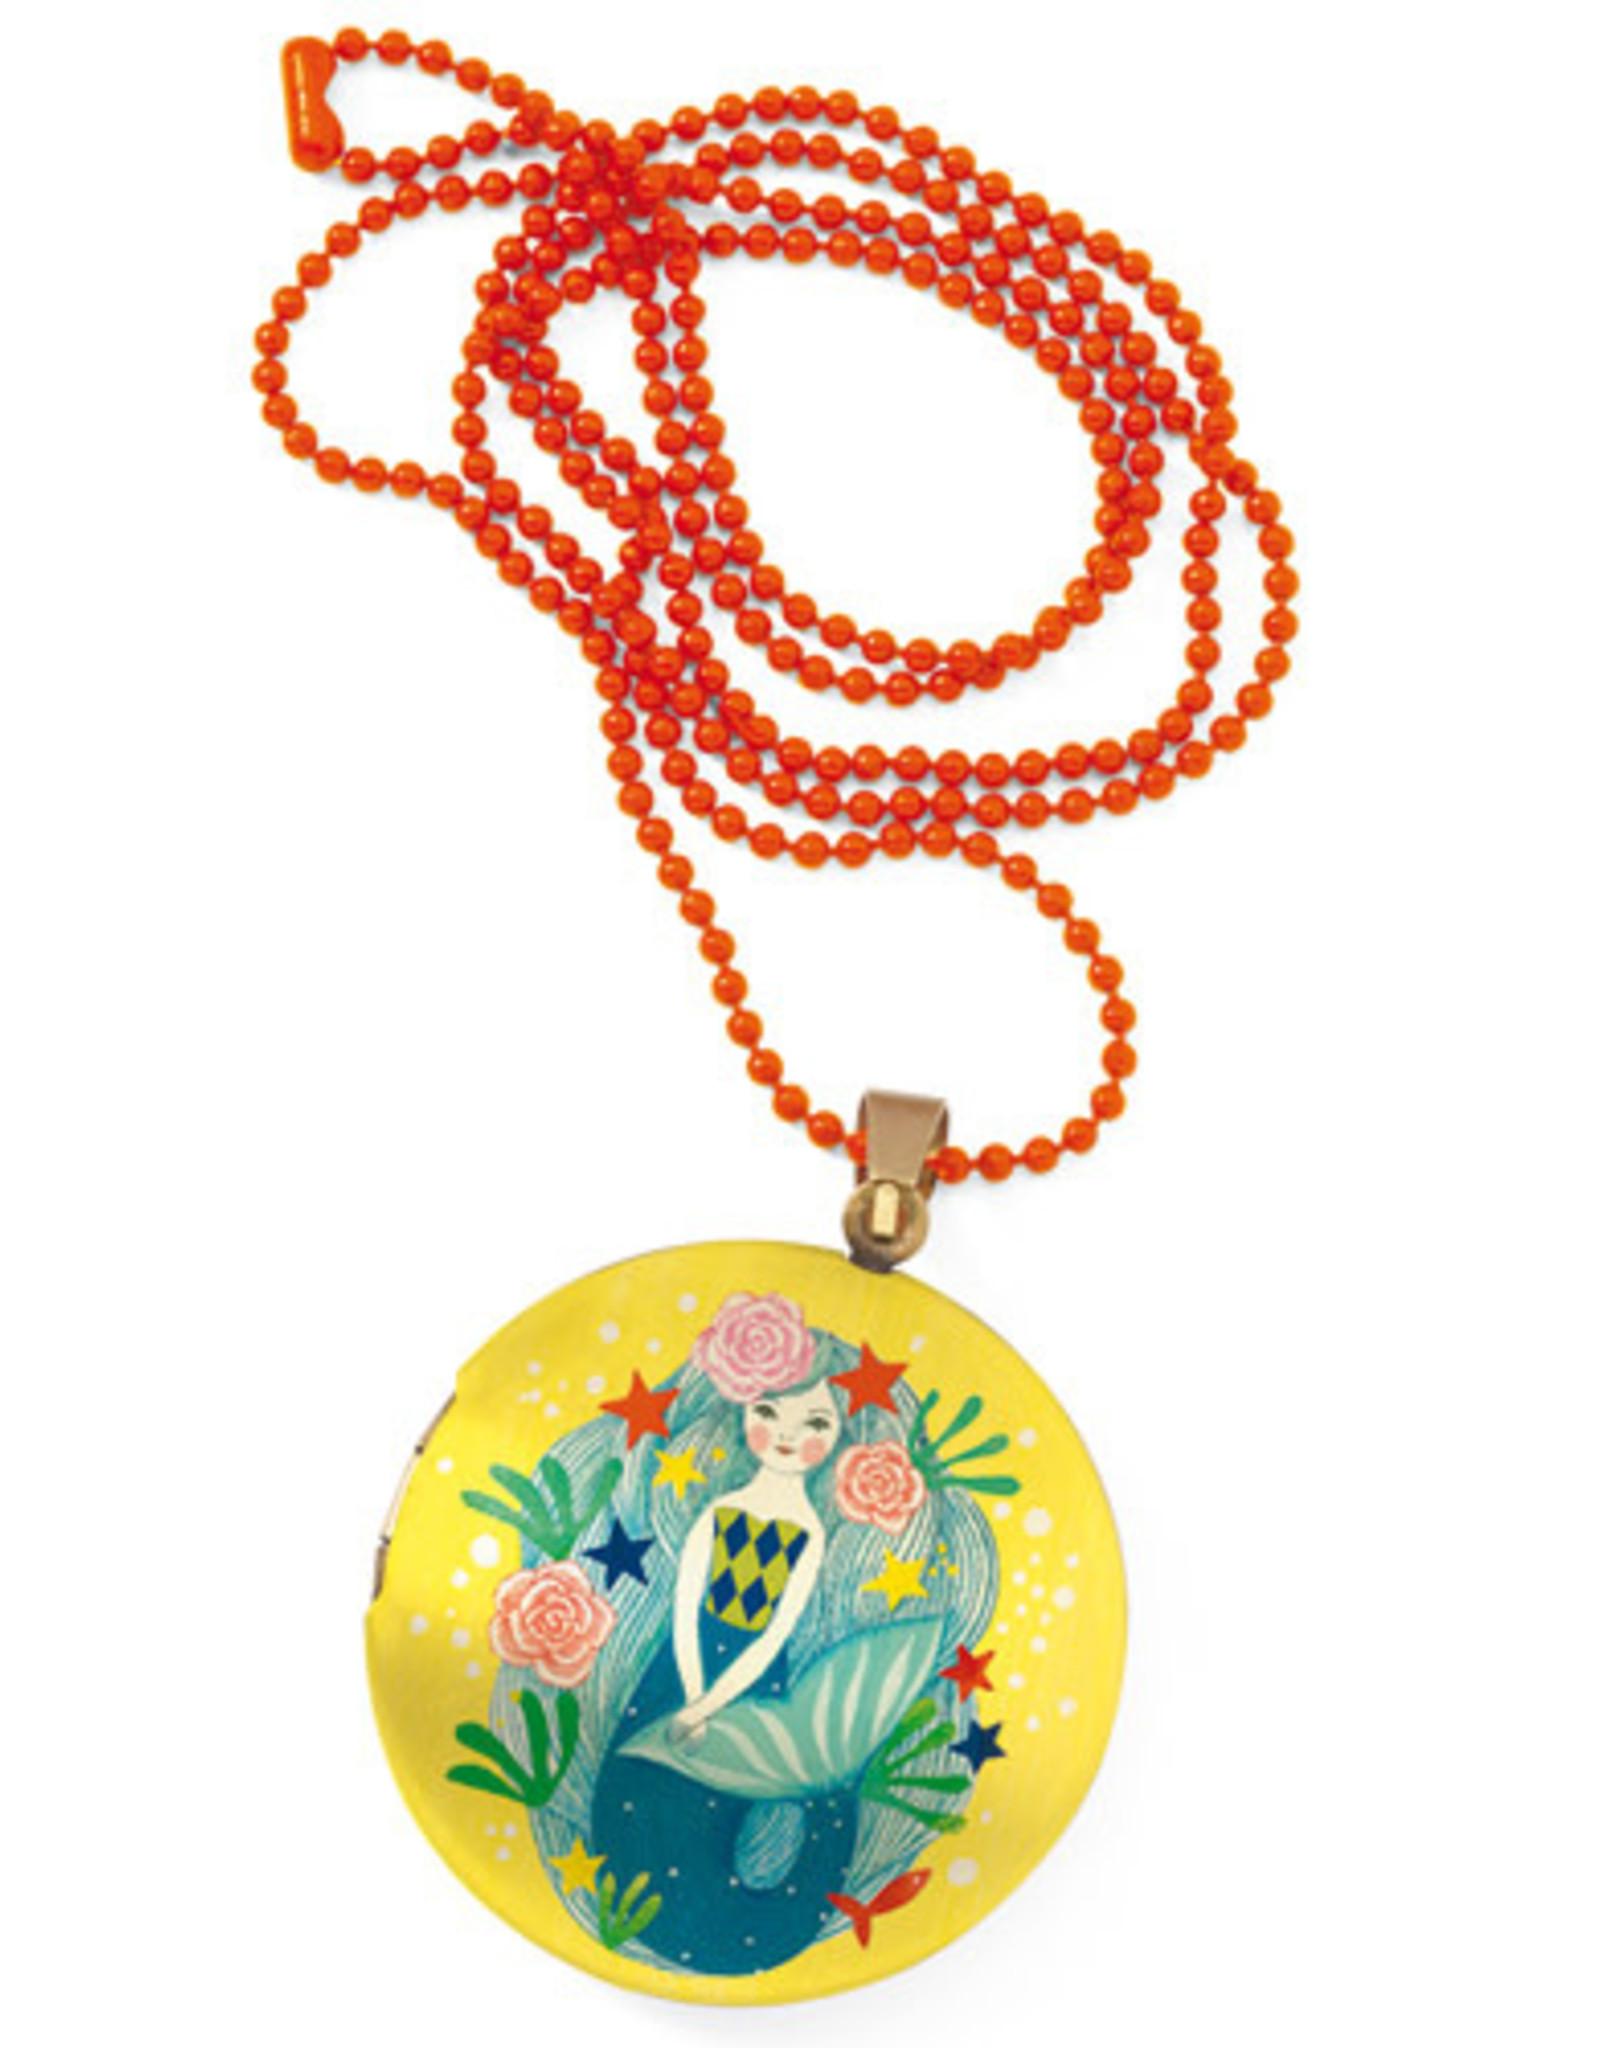 Djeco Mermaid Locket Necklace